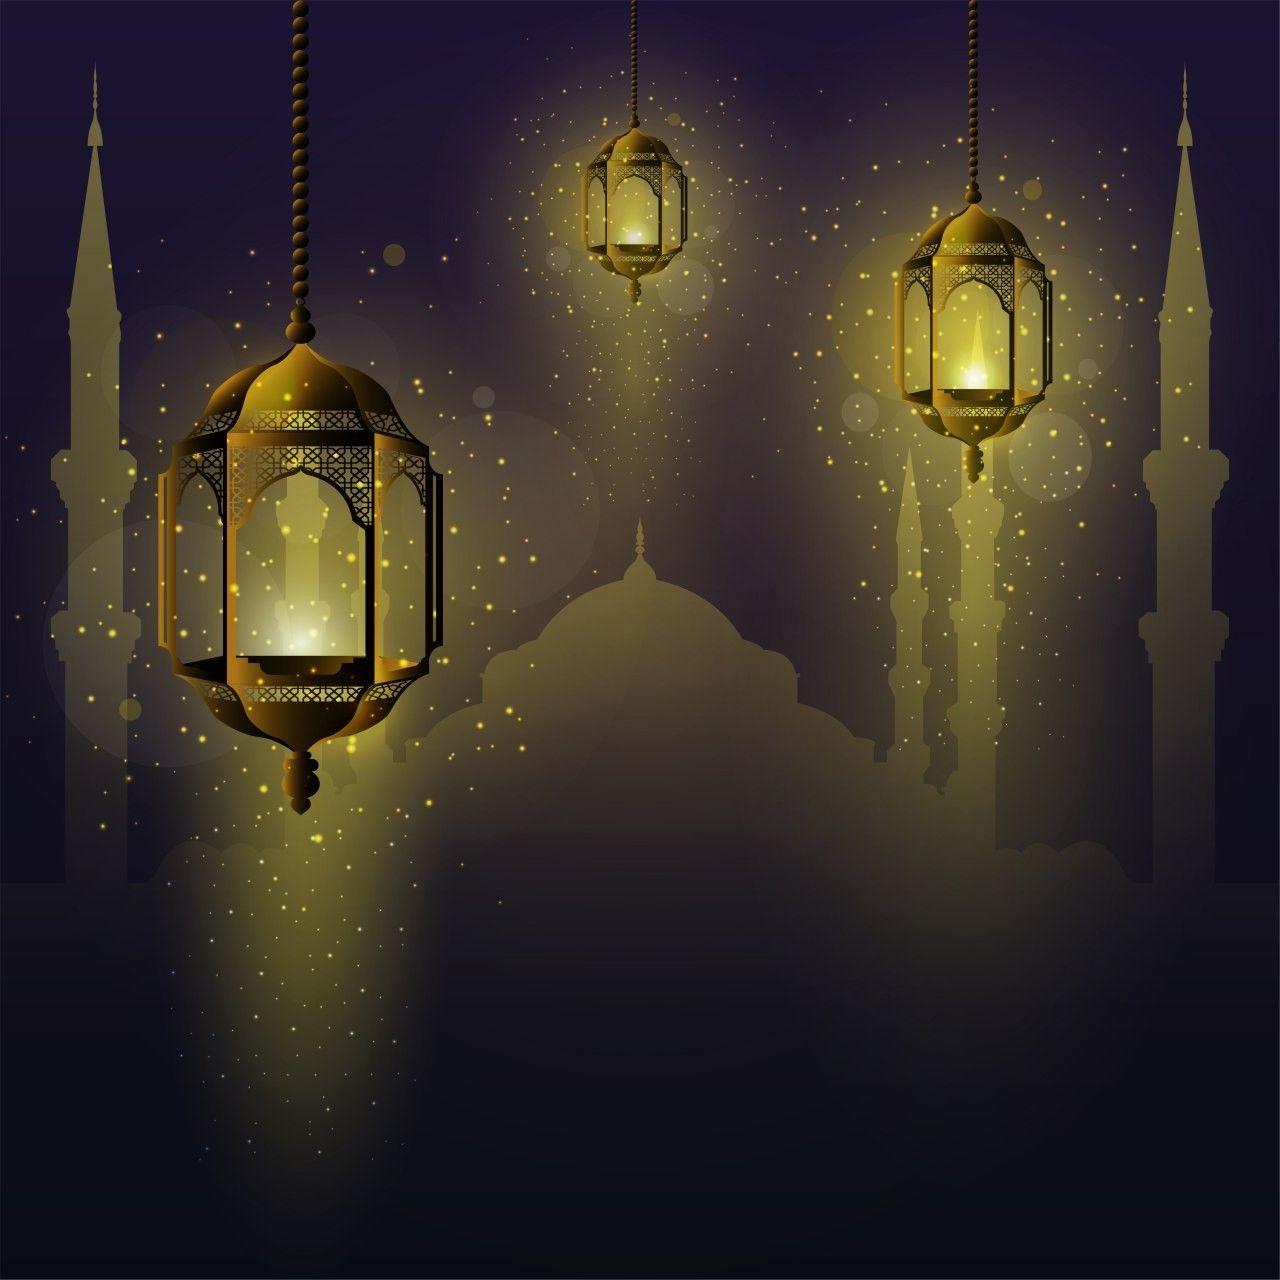 Pin Oleh Loading Name Please Wait Di بطاقات لرمضان للكتابة عليها Seni Islamis Wallpaper Ponsel Seni